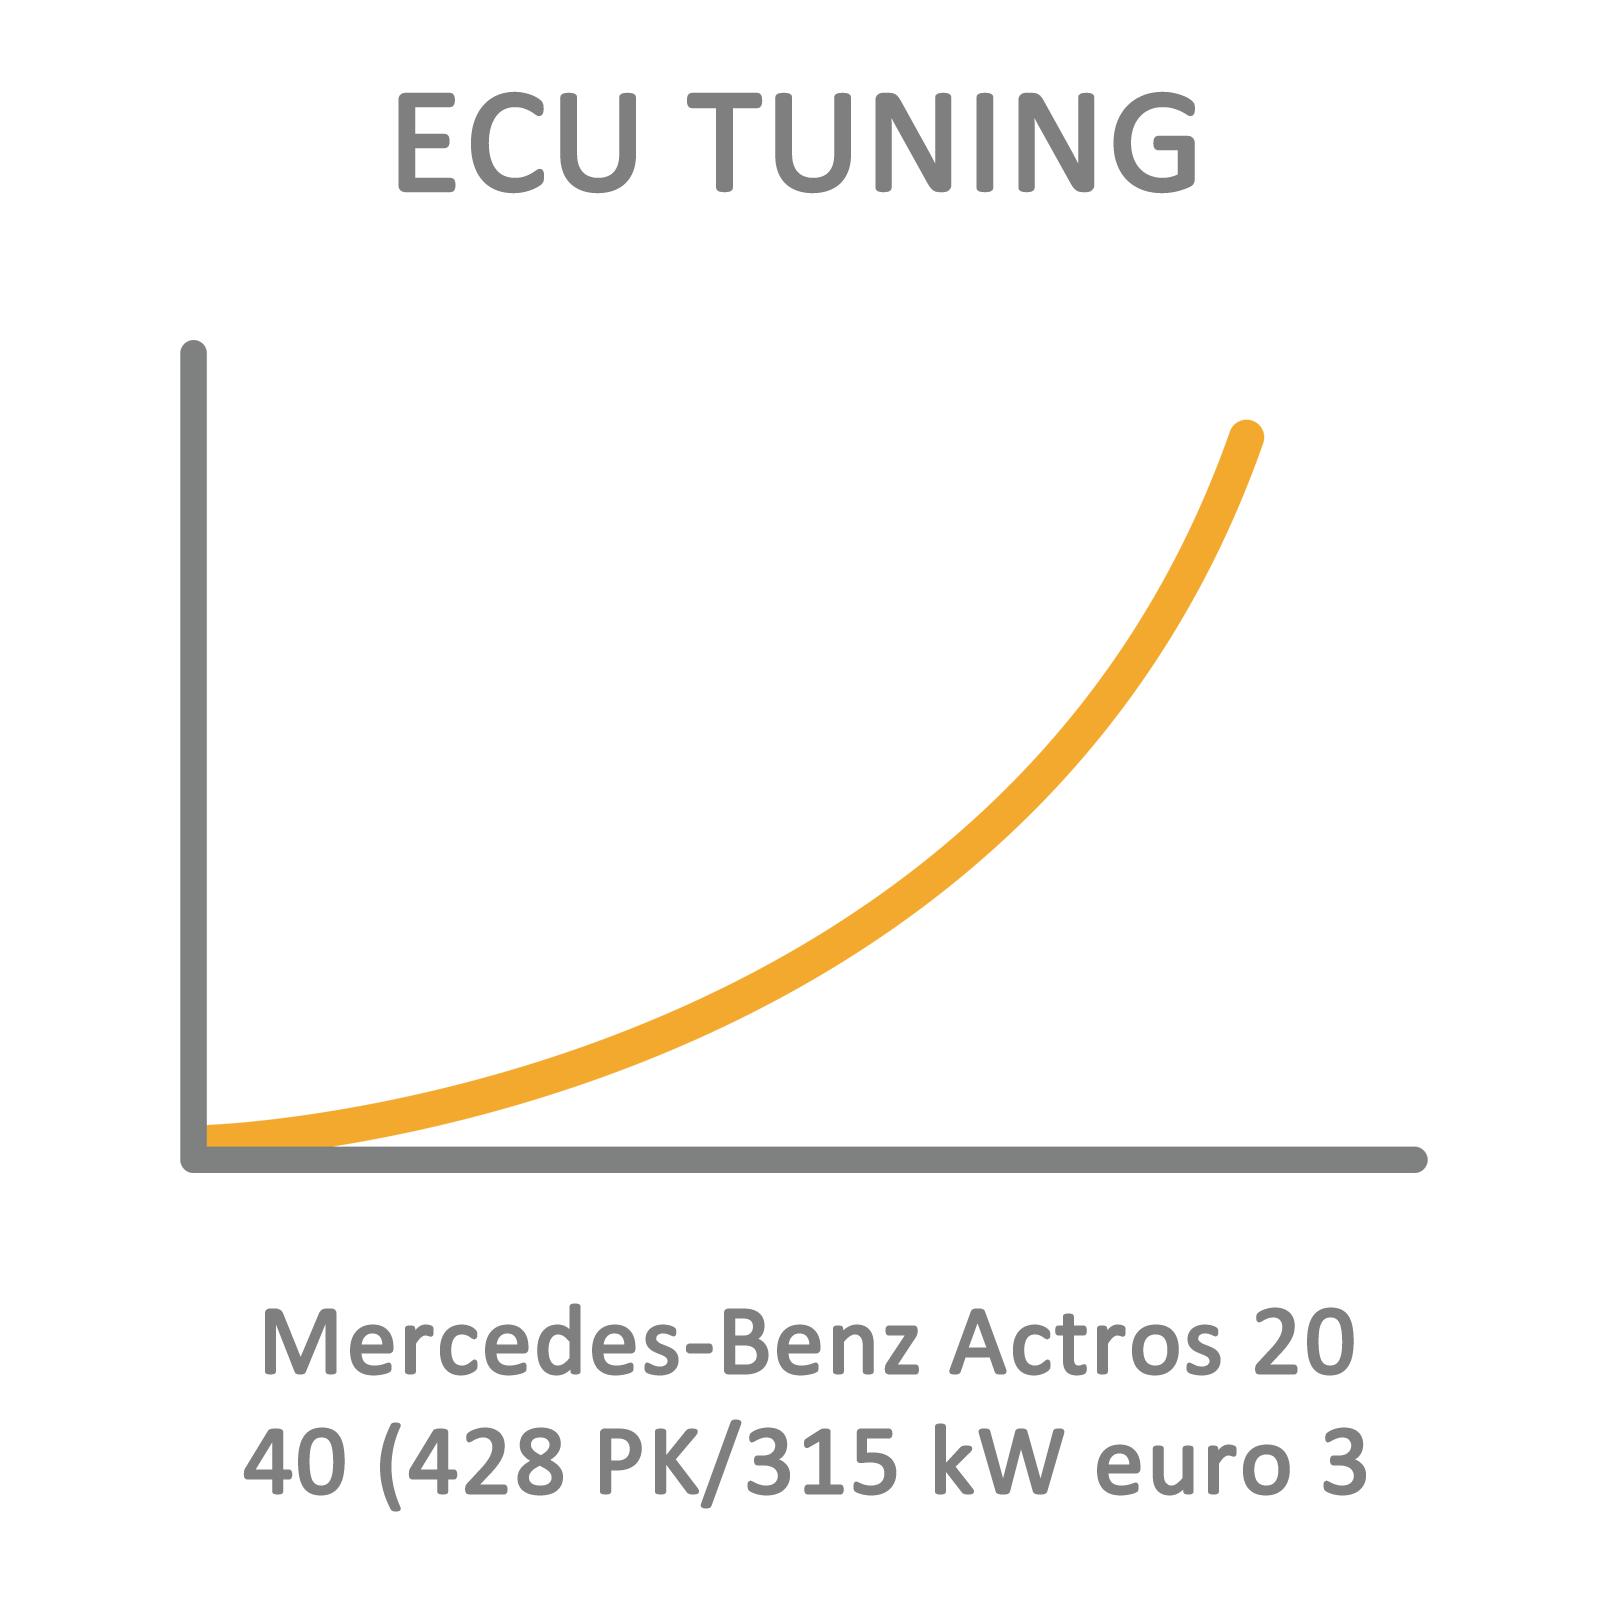 Mercedes-Benz Actros 20 40 (428 PK/315 kW euro 3 ECU